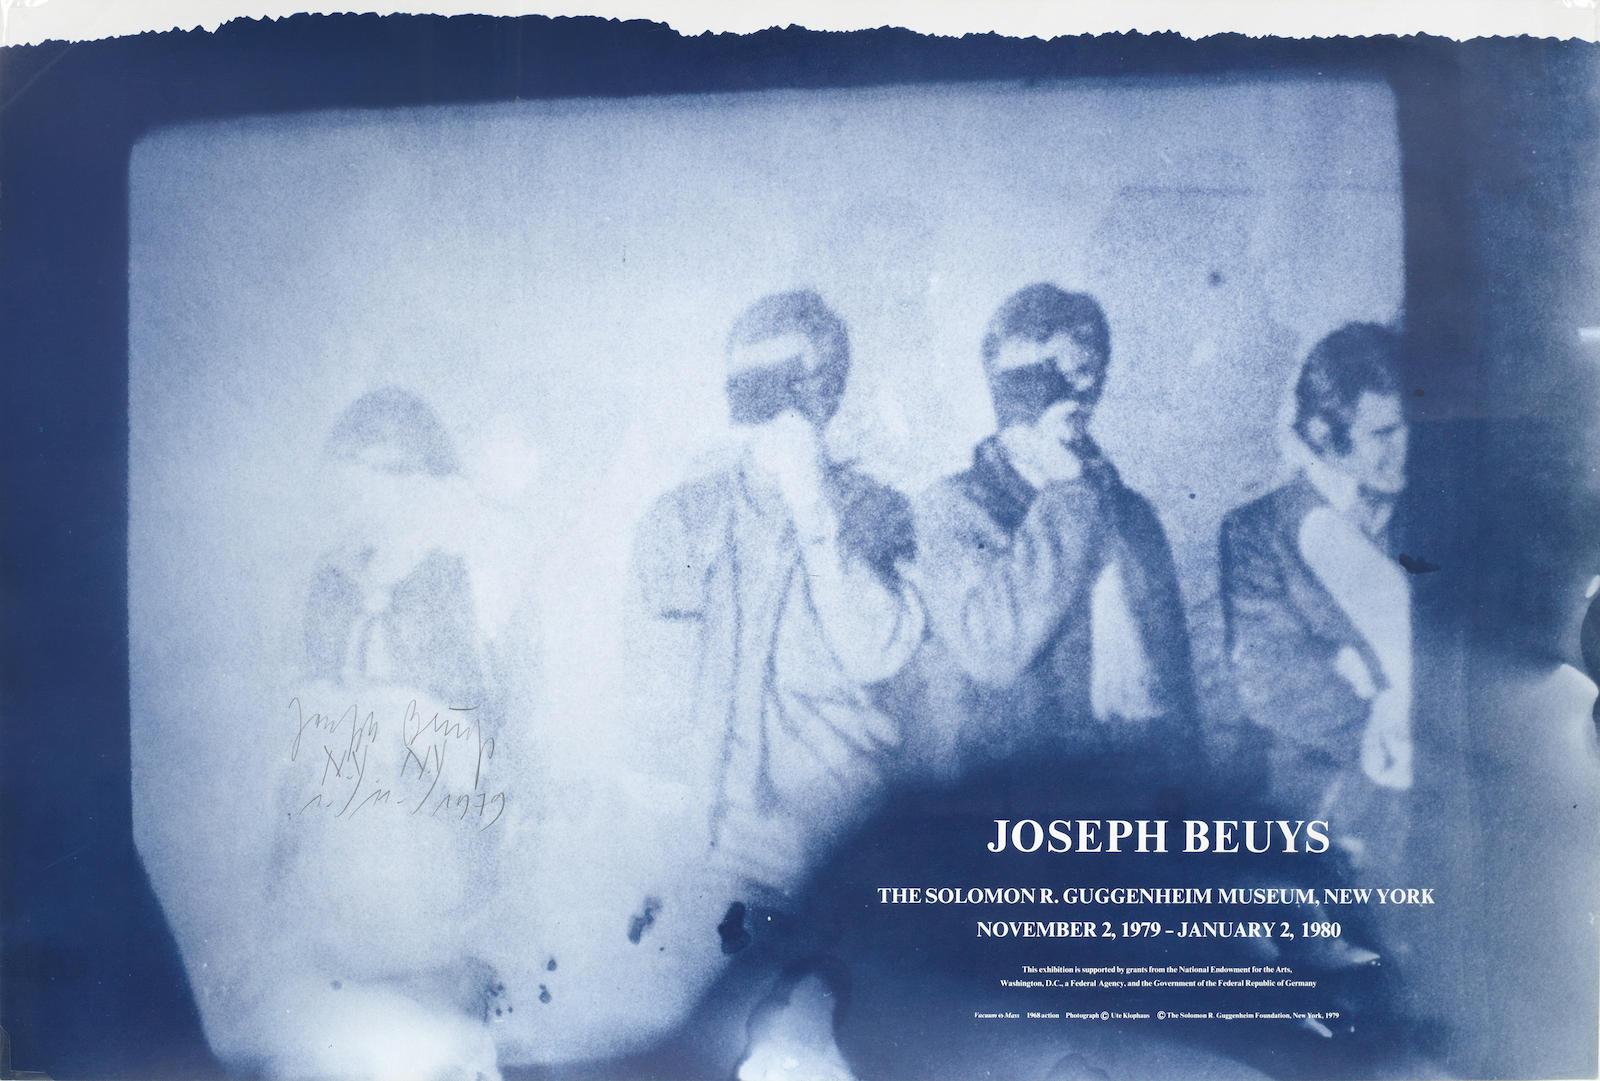 Joseph Beuys-Poster for the 1979 Guggenheim Retrospective-1979